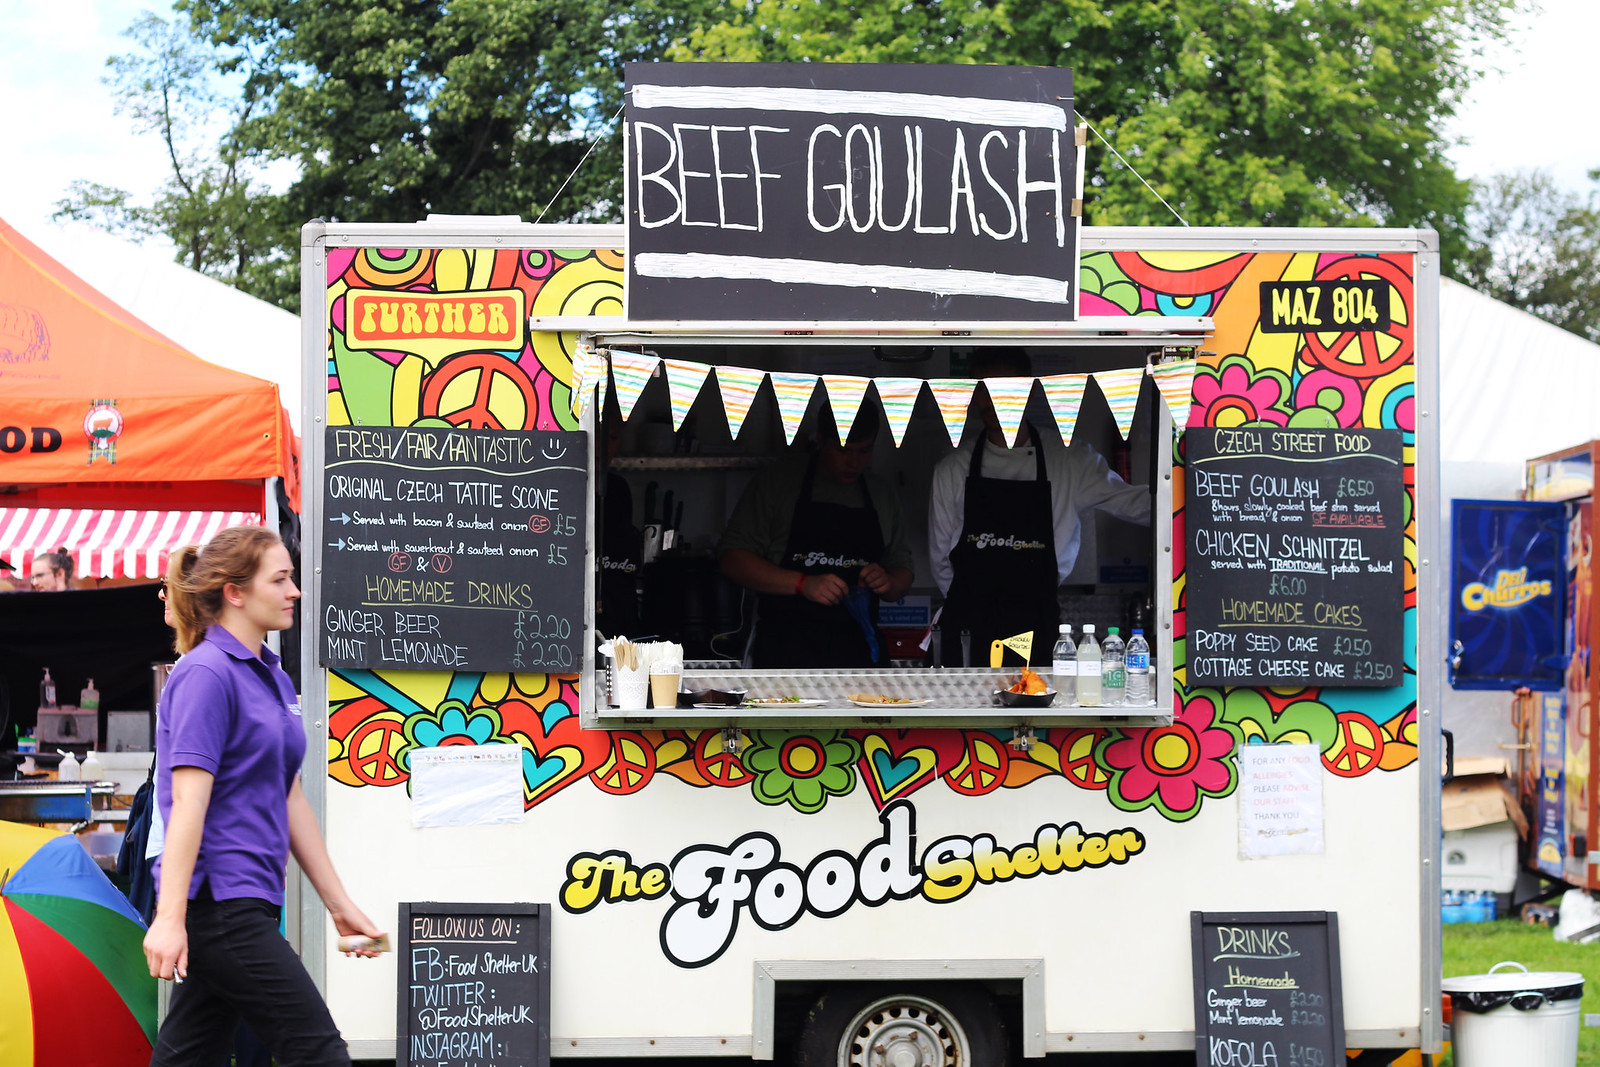 Edinburgh Foodies Festival Summer Inverleith Park Scotland UK lifestyle blogger